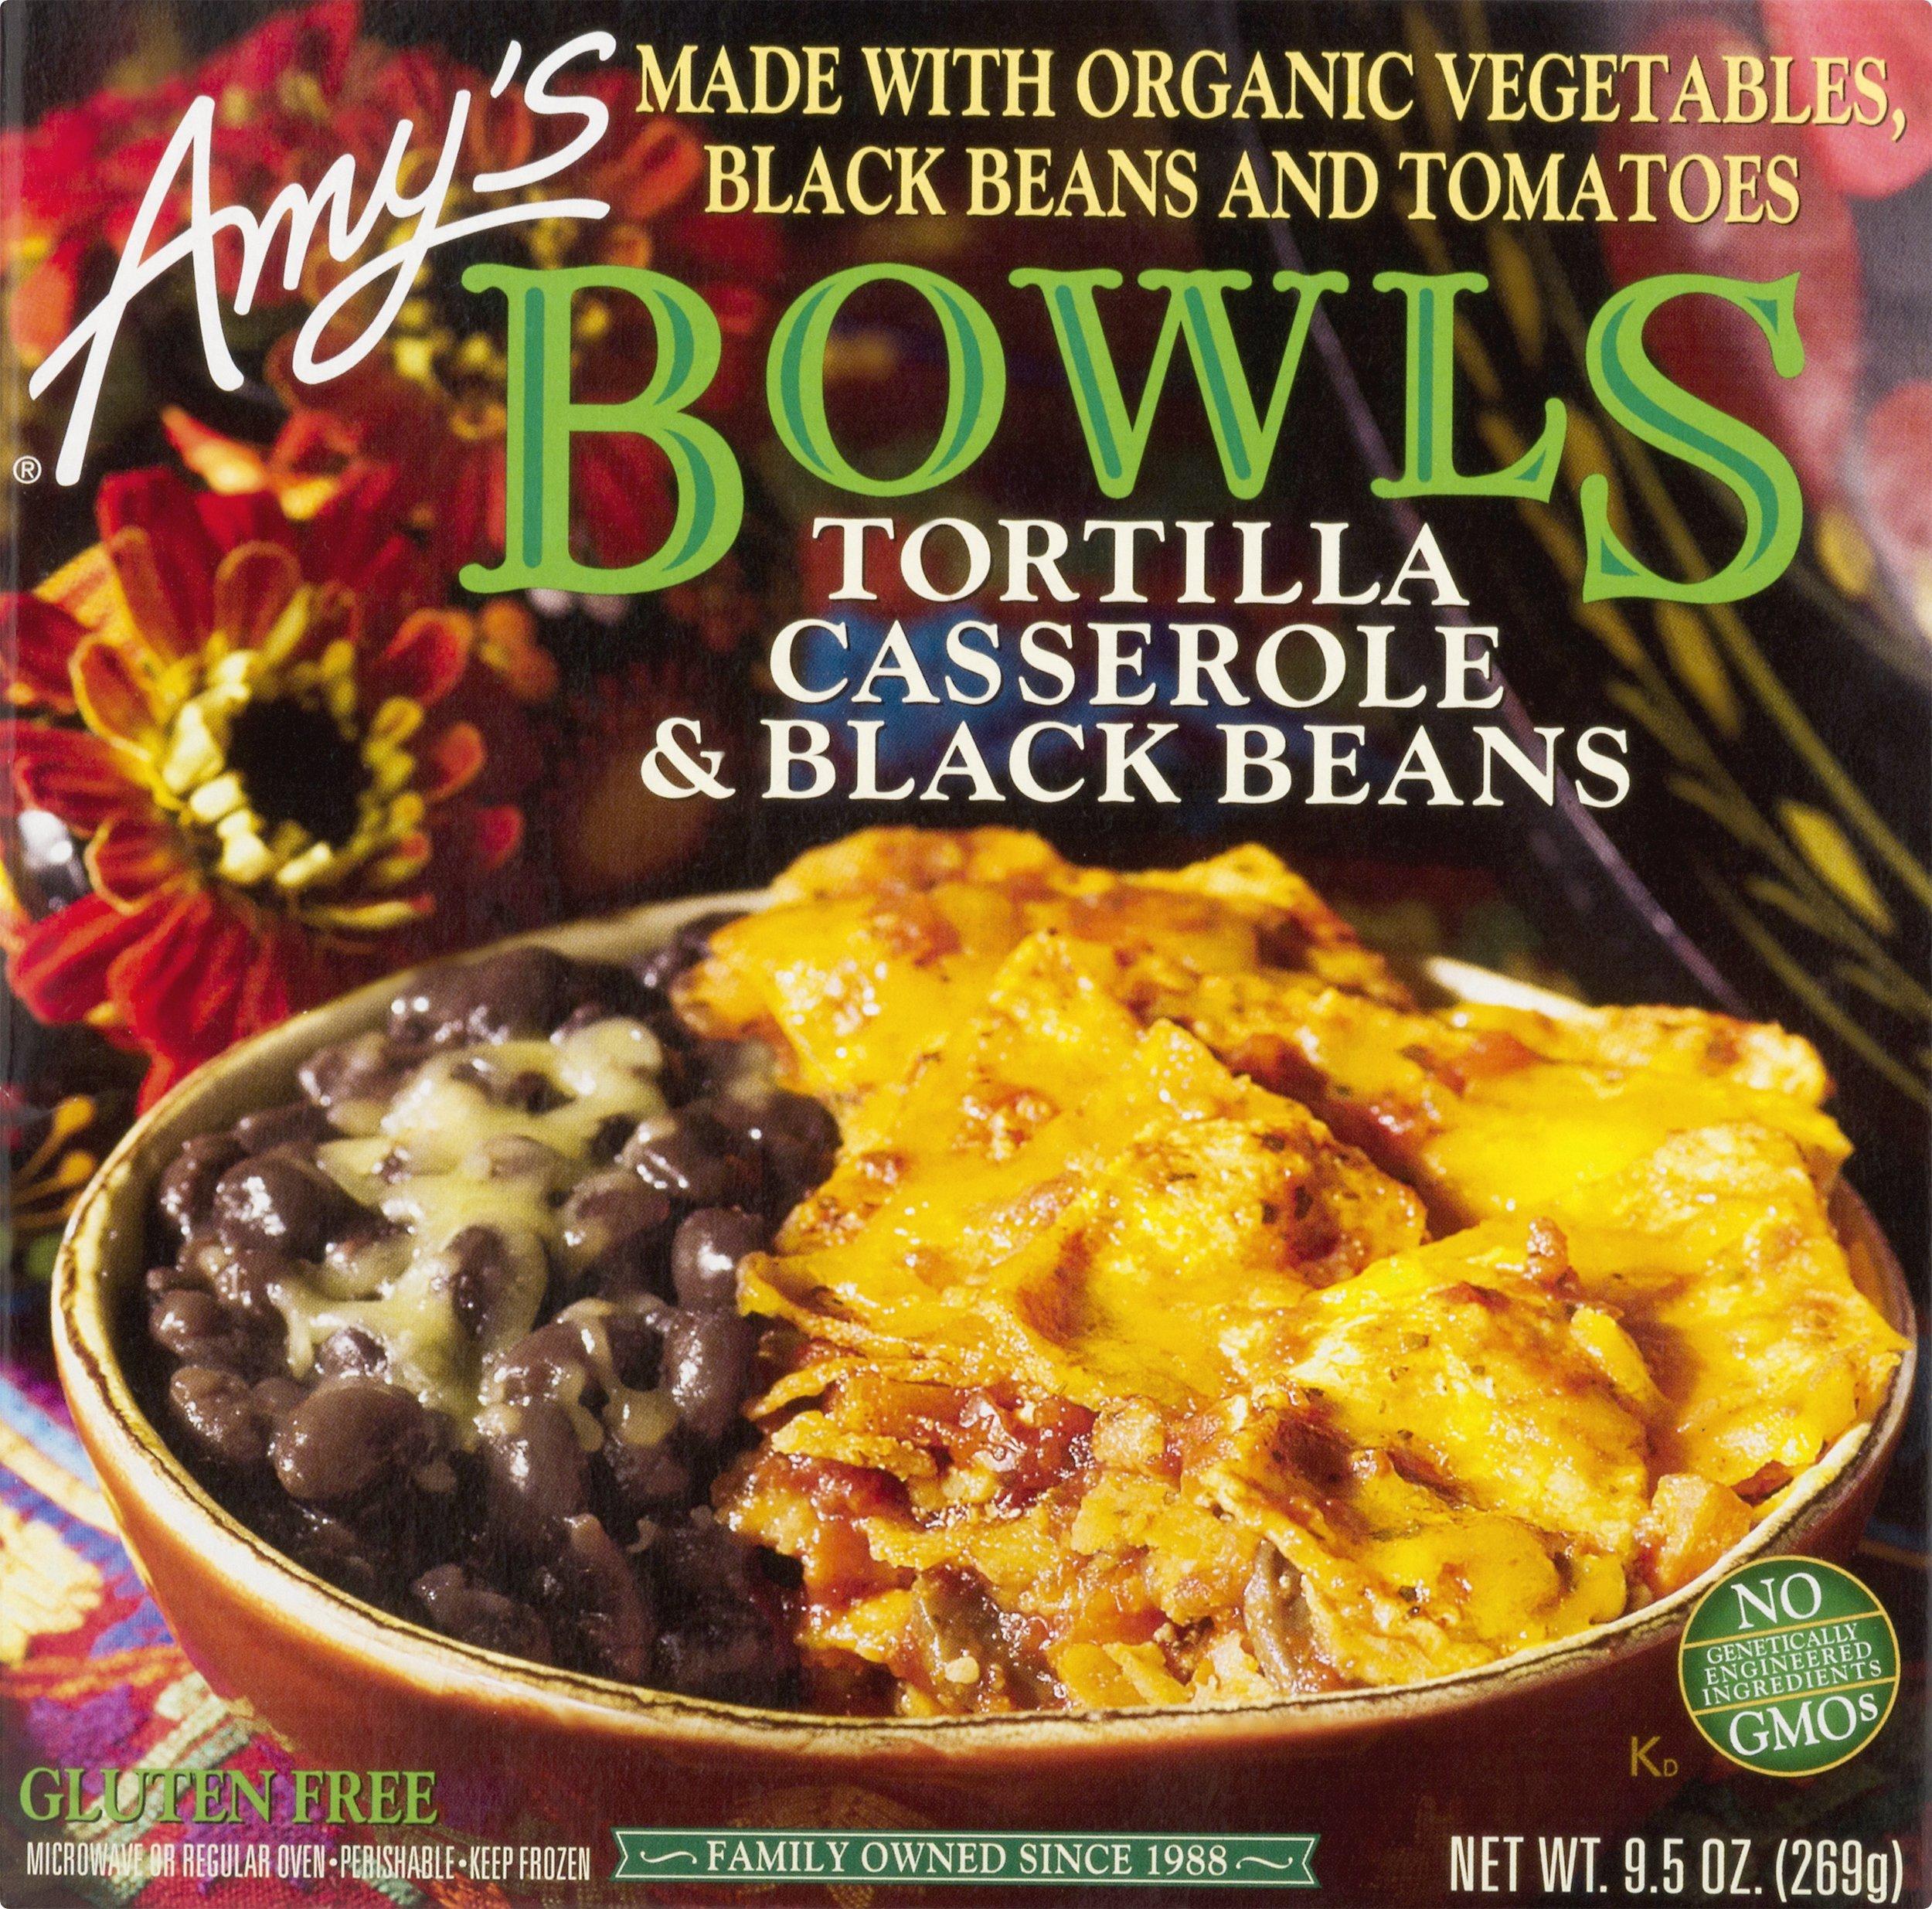 Amy's Bowls, Tortilla Casserole & Black Beans, 9.5 oz (Frozen) by Amy's